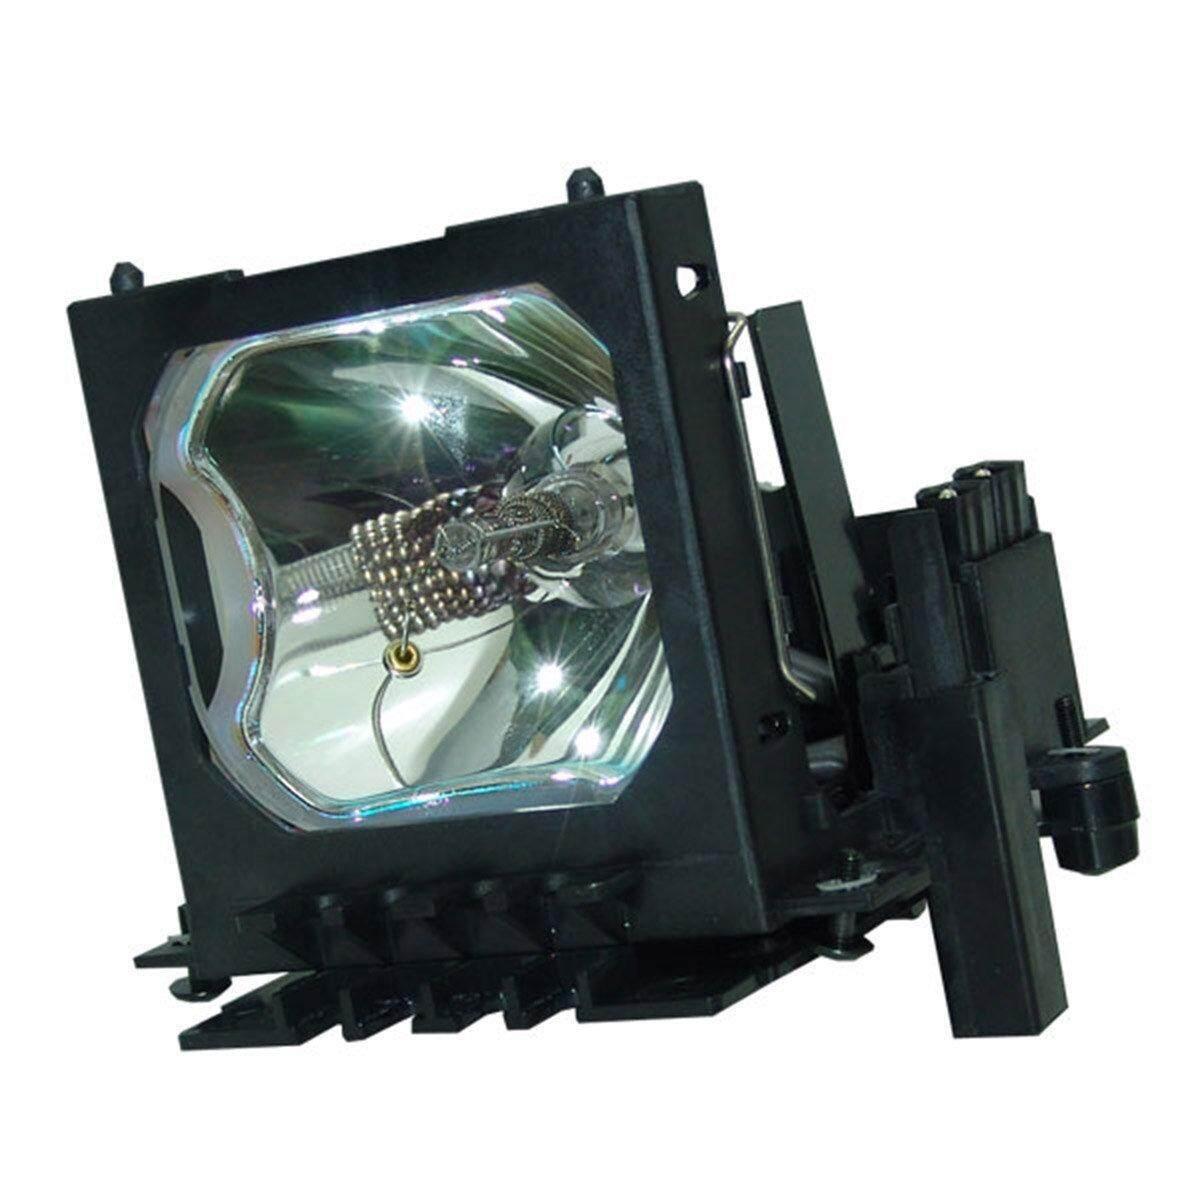 Daftar Harga Projector Hitachi Cp X5022wn Terbaru Oktober 2018 Ed27x Lamp Bulb Dt00591 Dt 00591 For X1200 X1200w